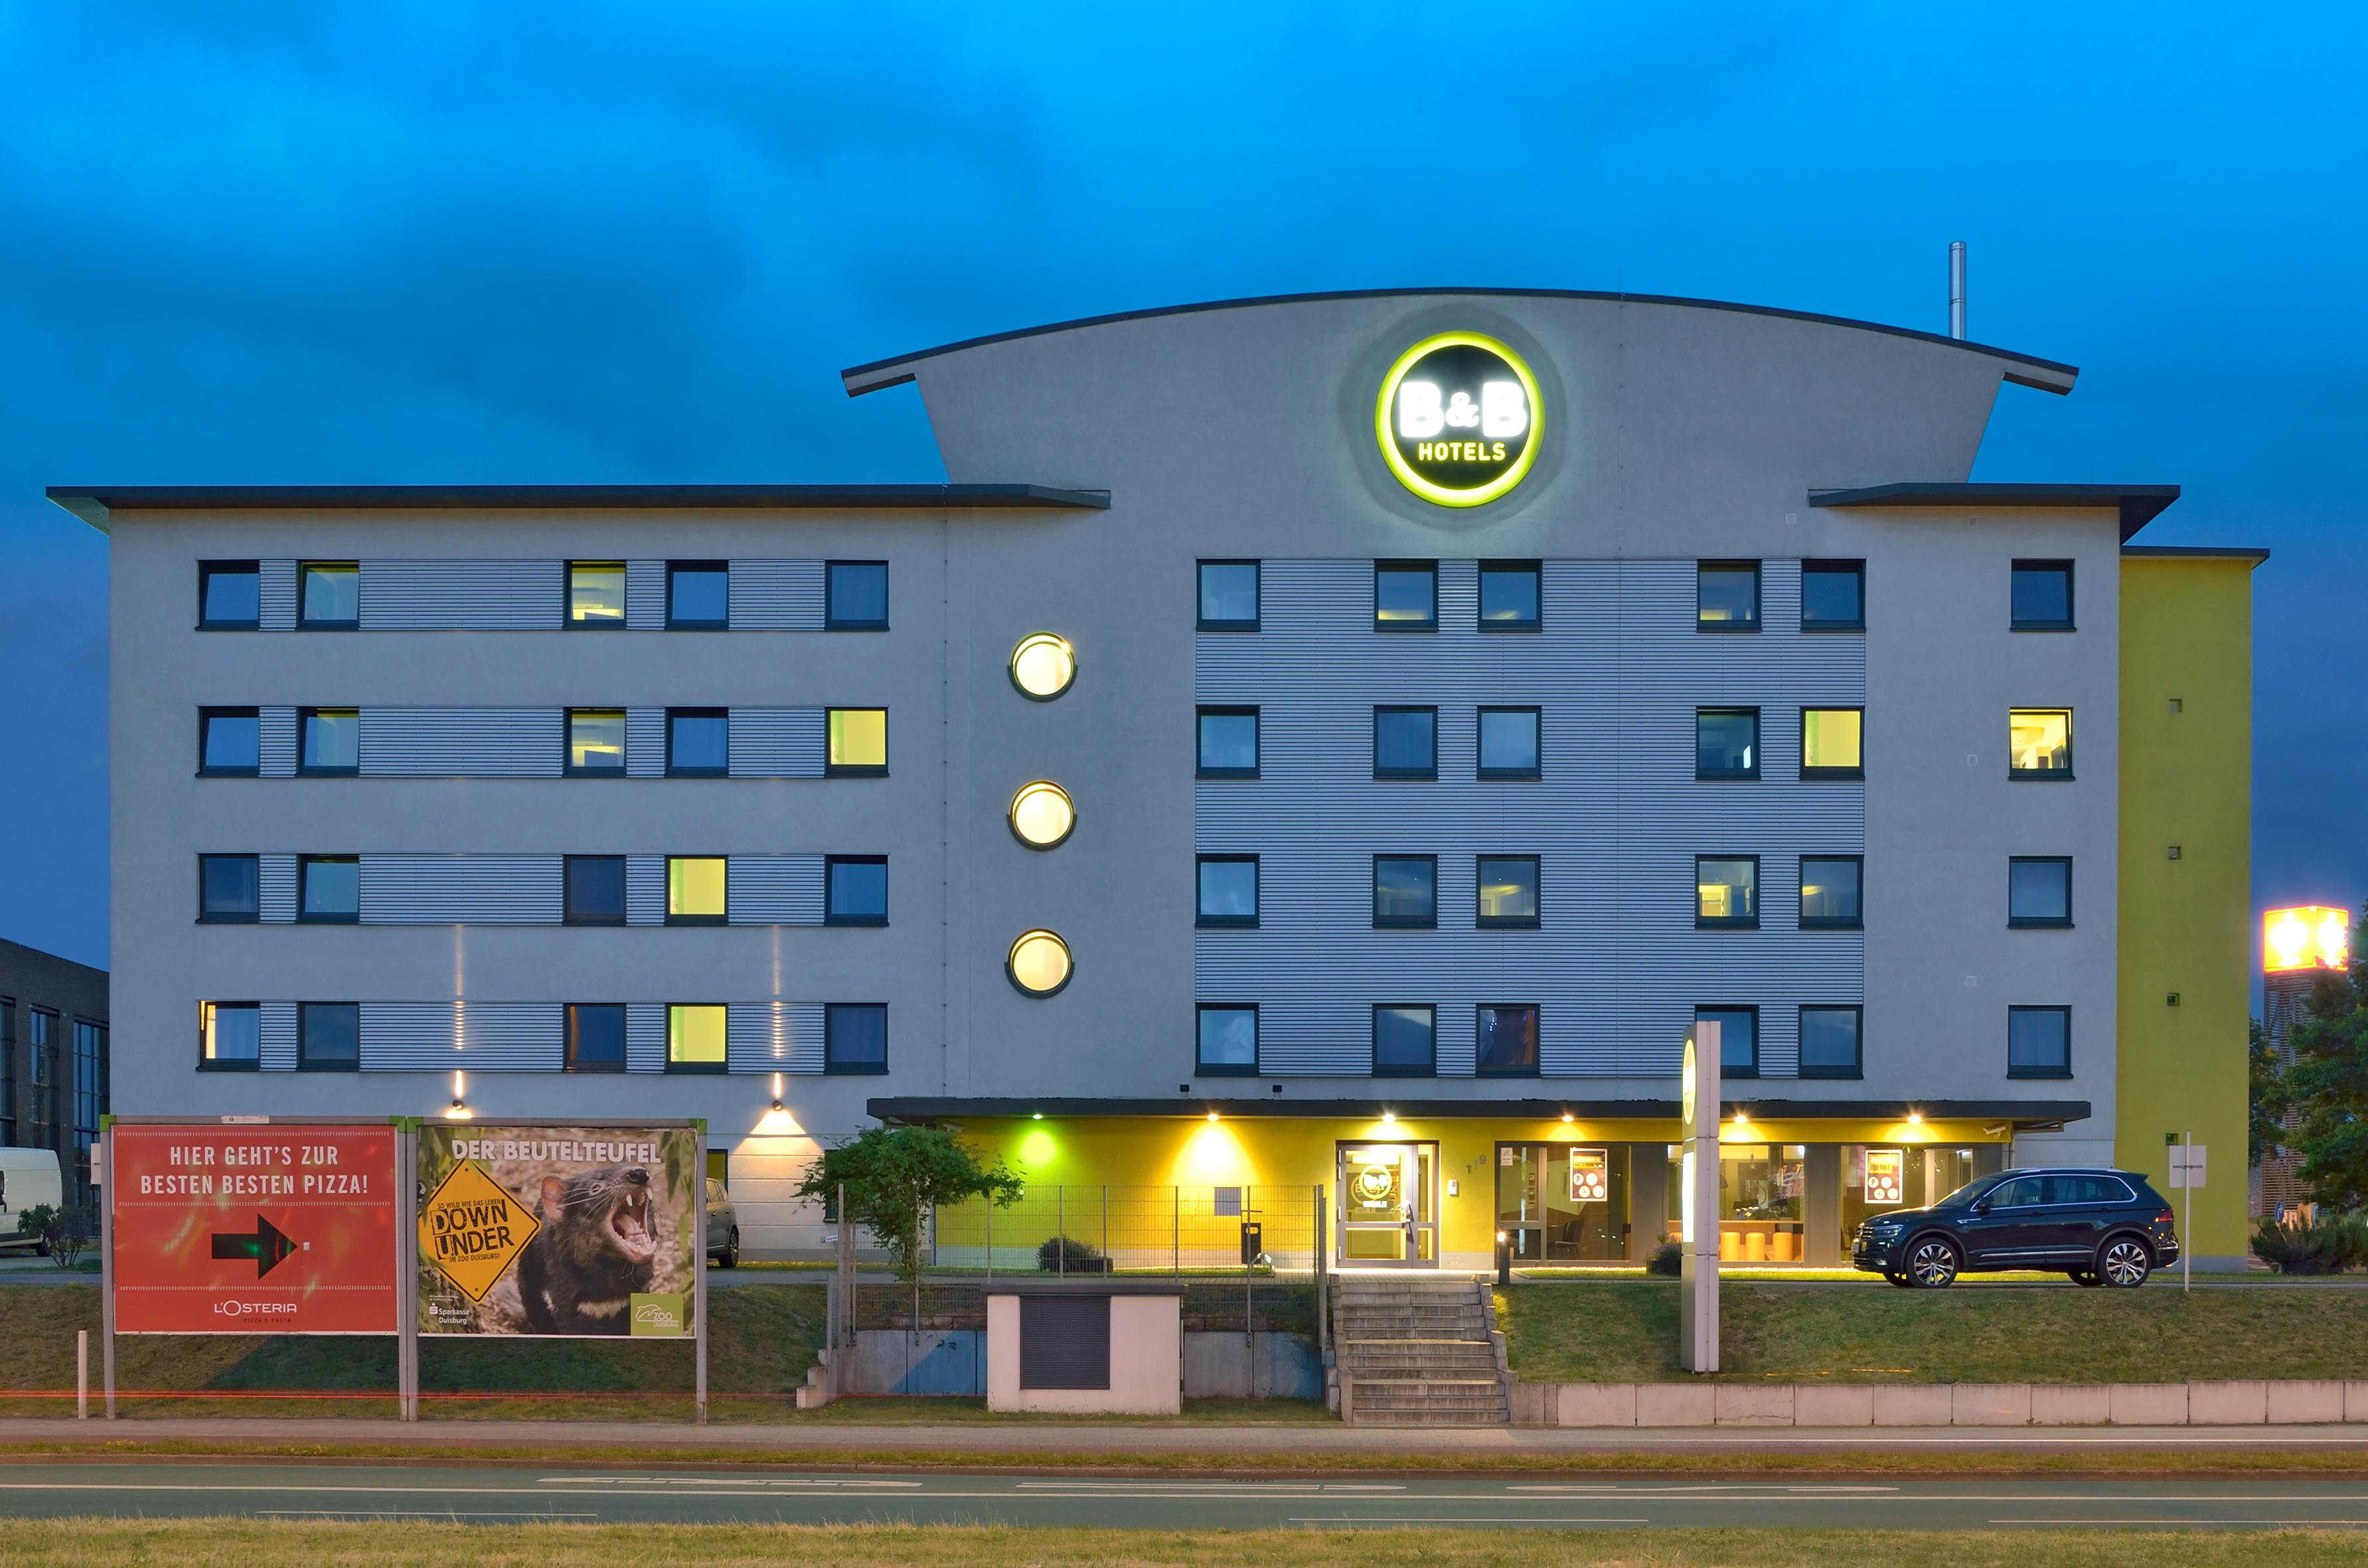 B&B Hotel Oberhausen am Centro, Brammenring 119 in Oberhausen